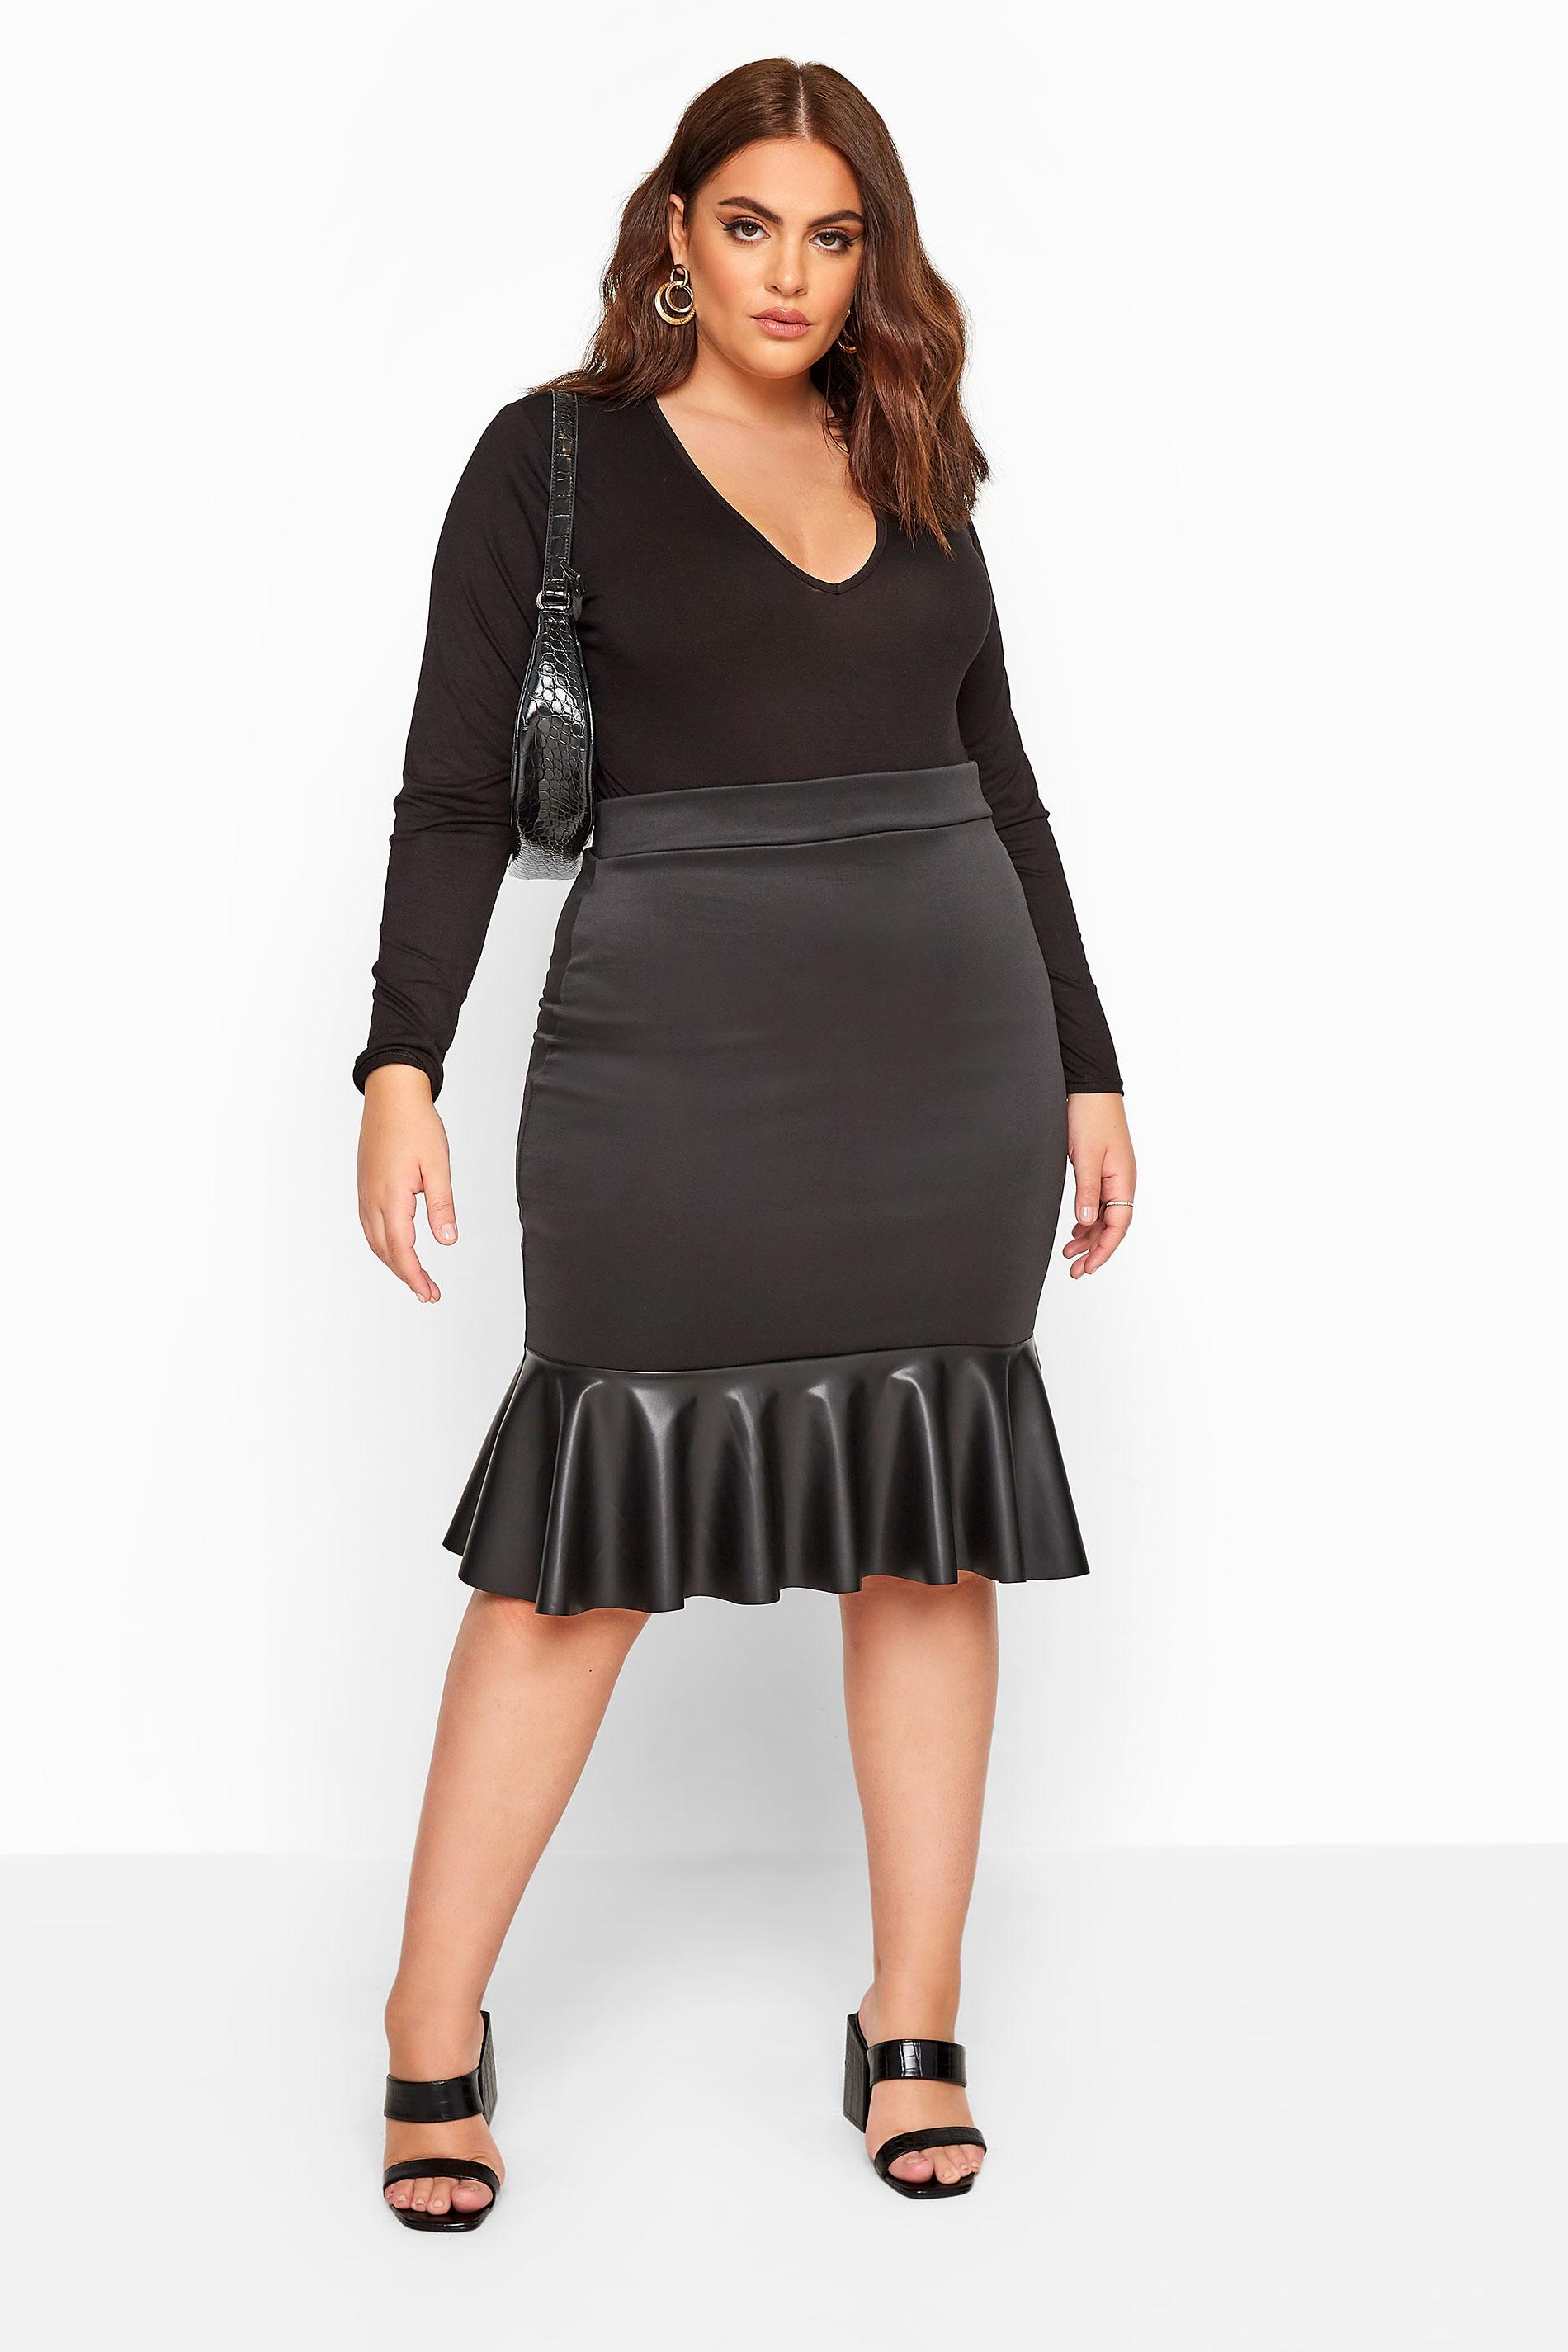 YOURS LONDON Black Scuba Crepe PU Frill Skirt